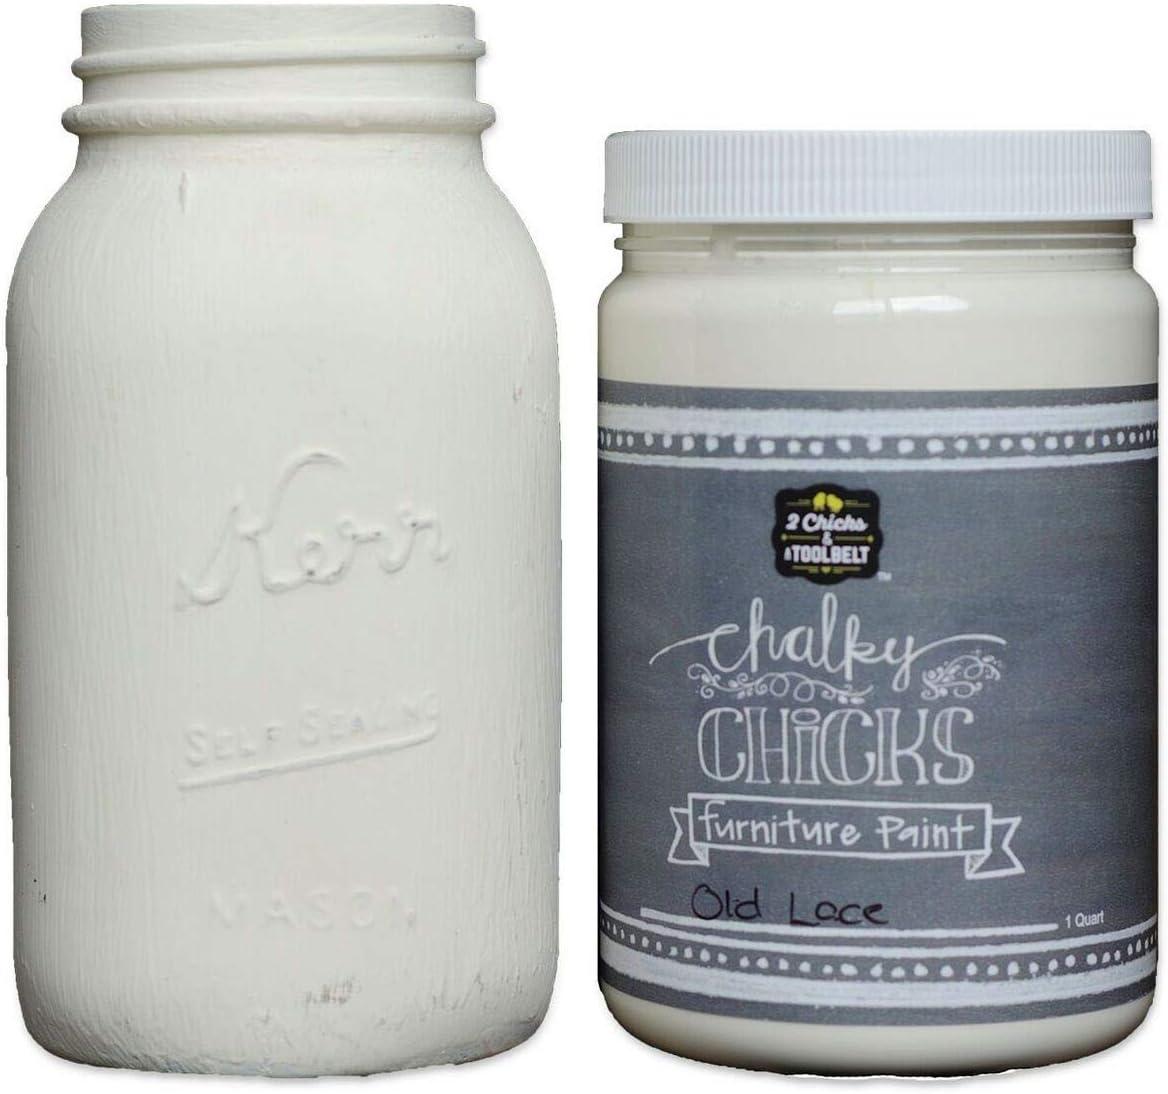 Chalk Finish Paint - Furniture & Cabinet Paint (32 oz, Old Lace)